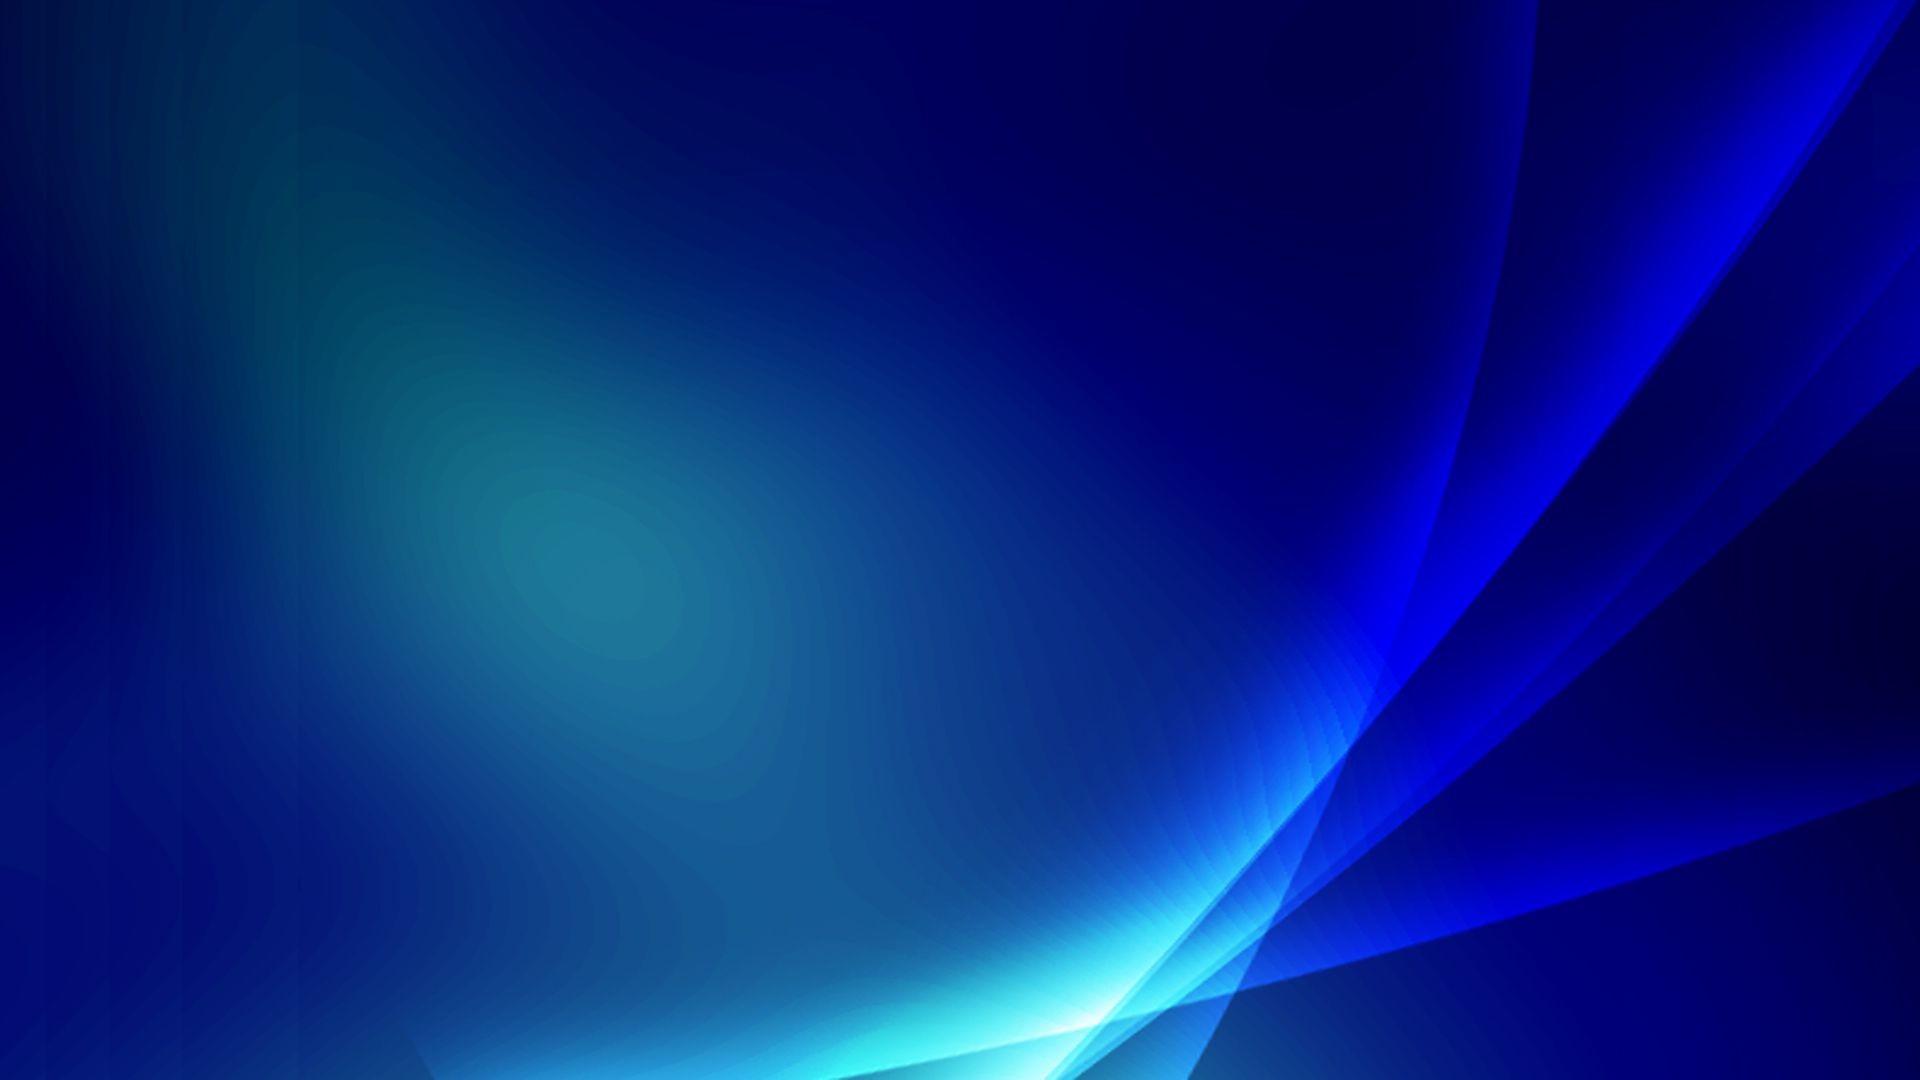 Royal Blue Background Free